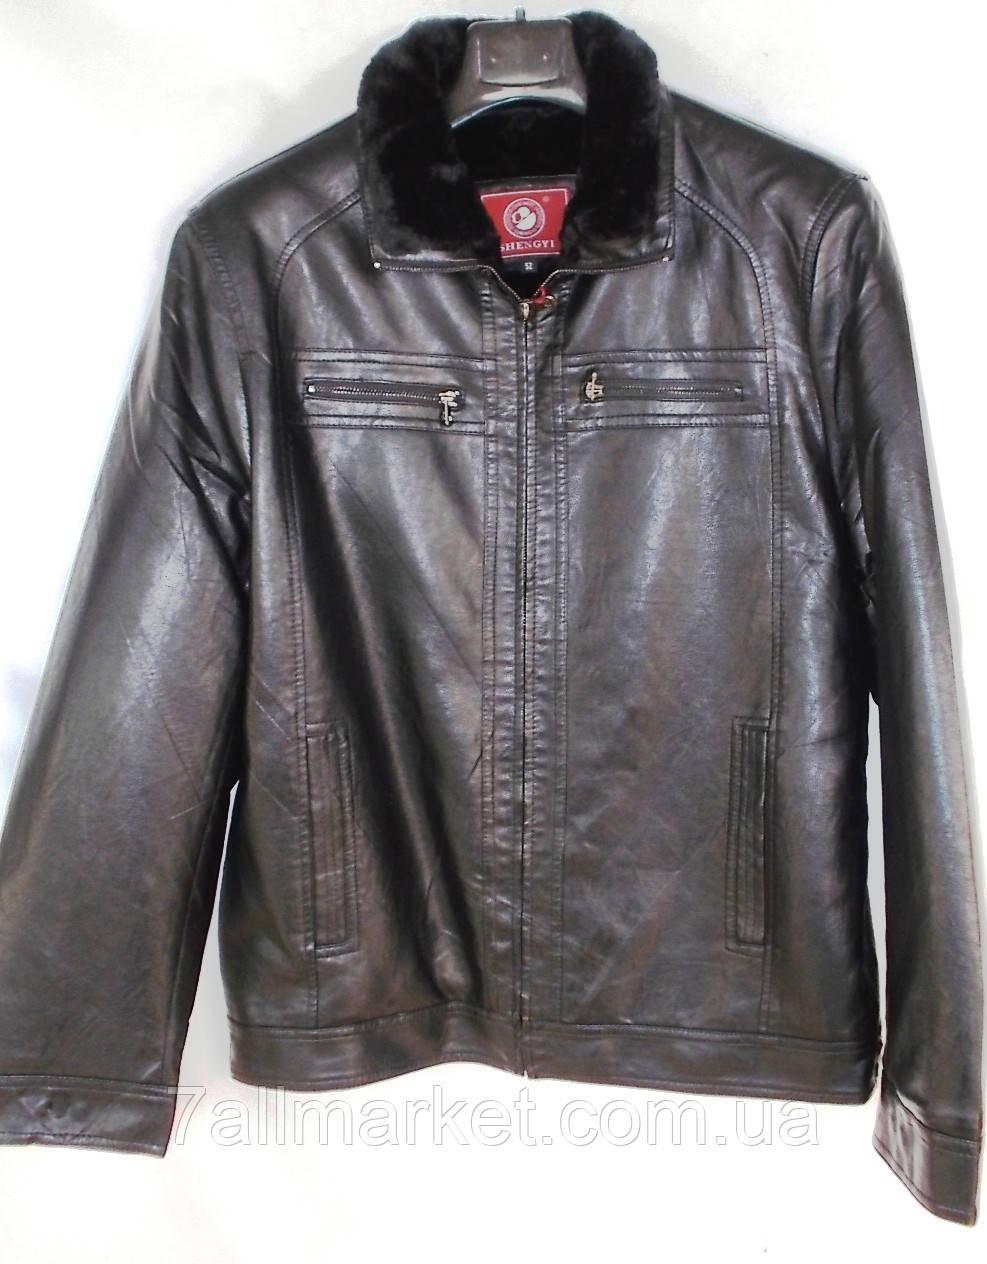 cd372c172c3 Куртка мужская зимняя кожзам